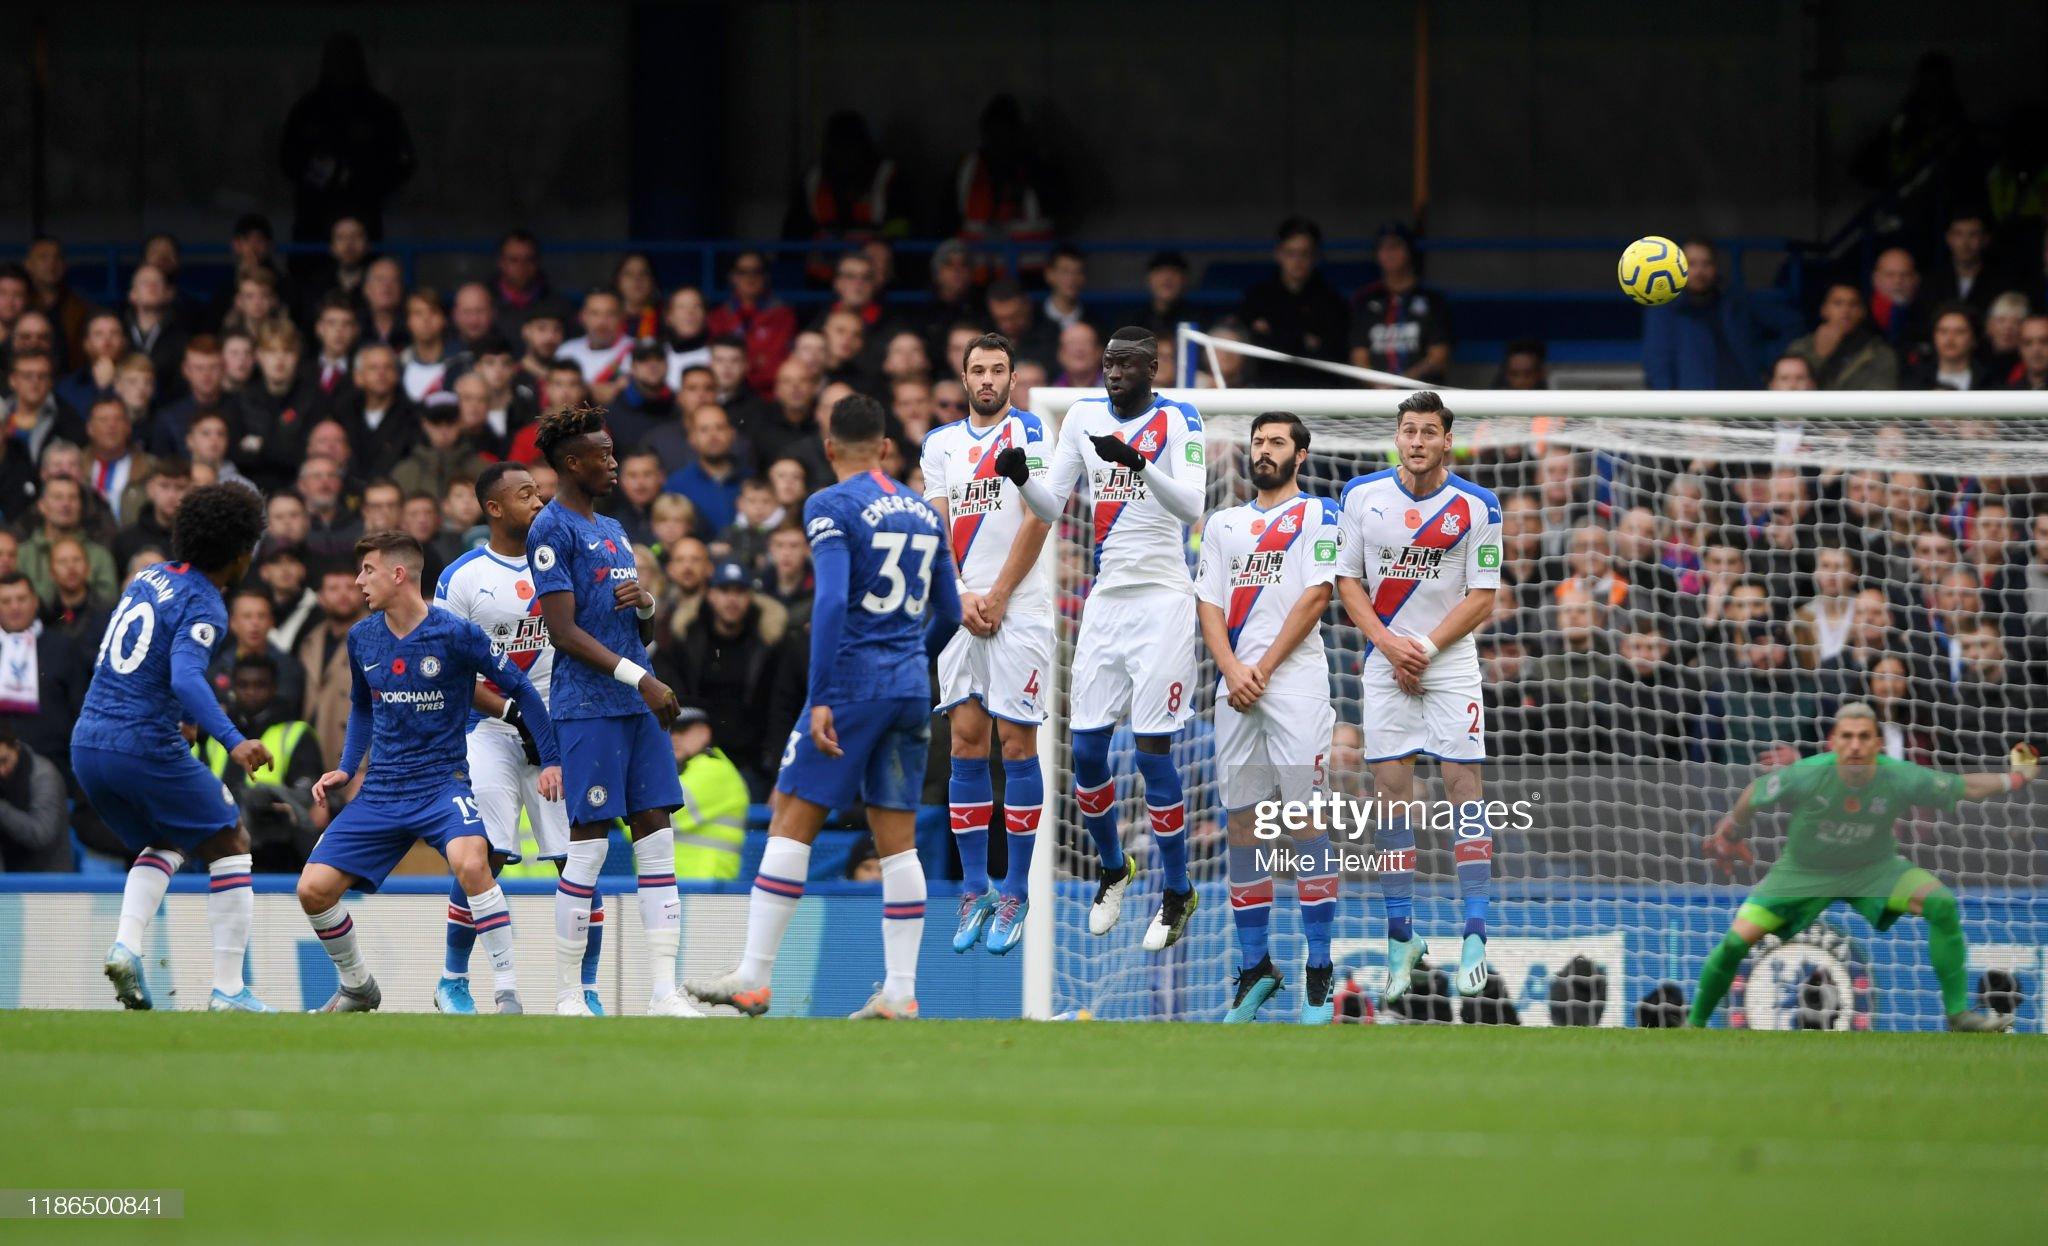 Chelsea FC v Crystal Palace - Premier League : News Photo